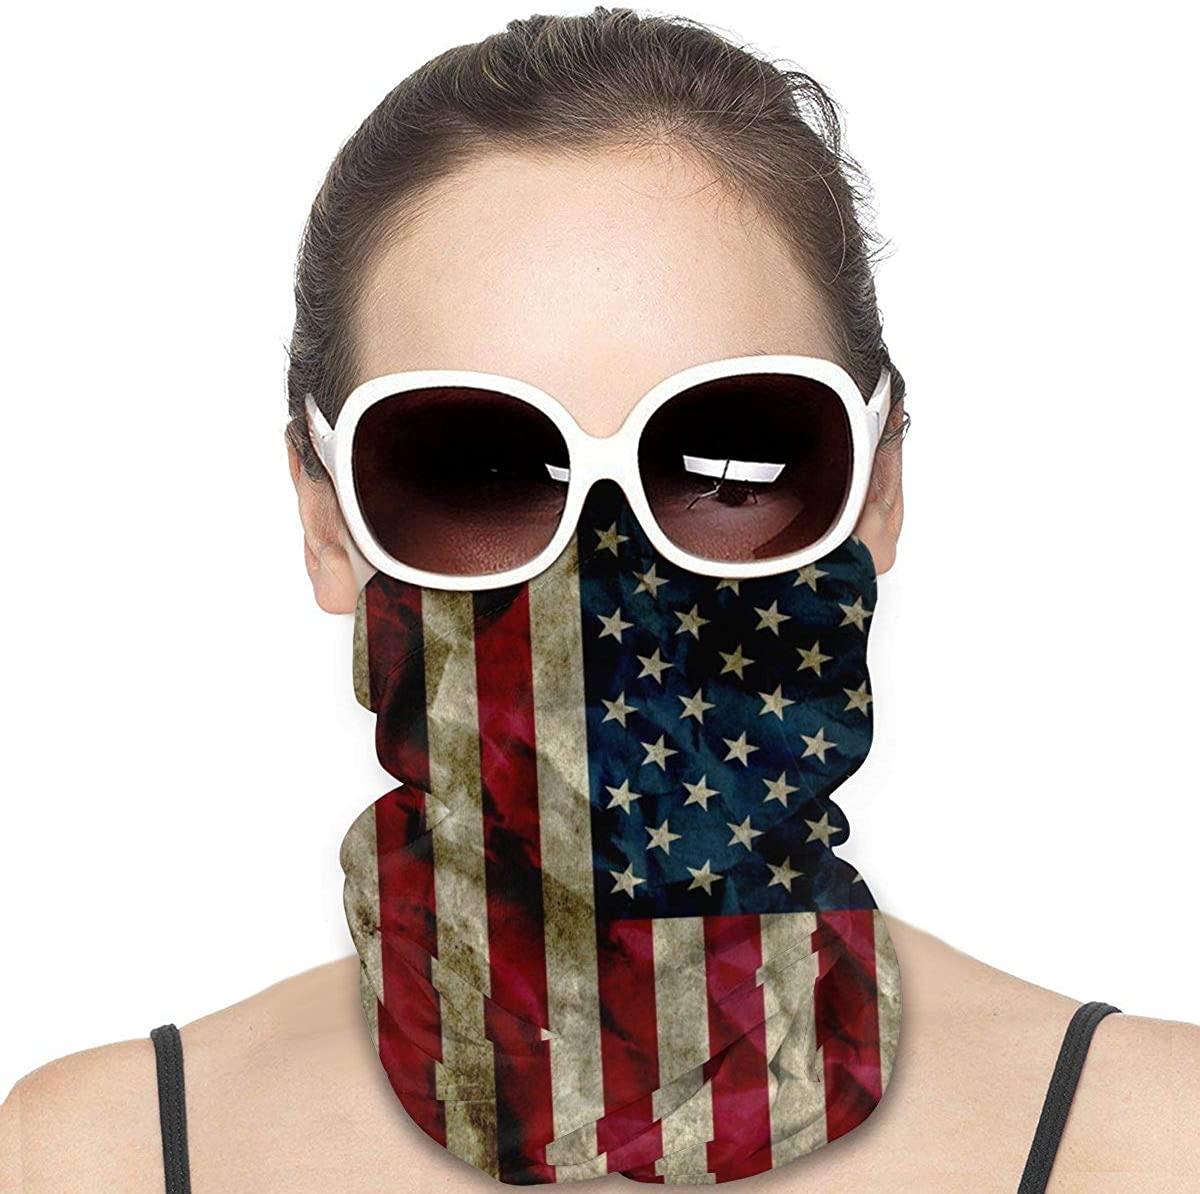 niujinmali Novelty Seamless Face Mask - Vintage American Flag Bandanas for Dust, Outdoors, Festivals, Sports